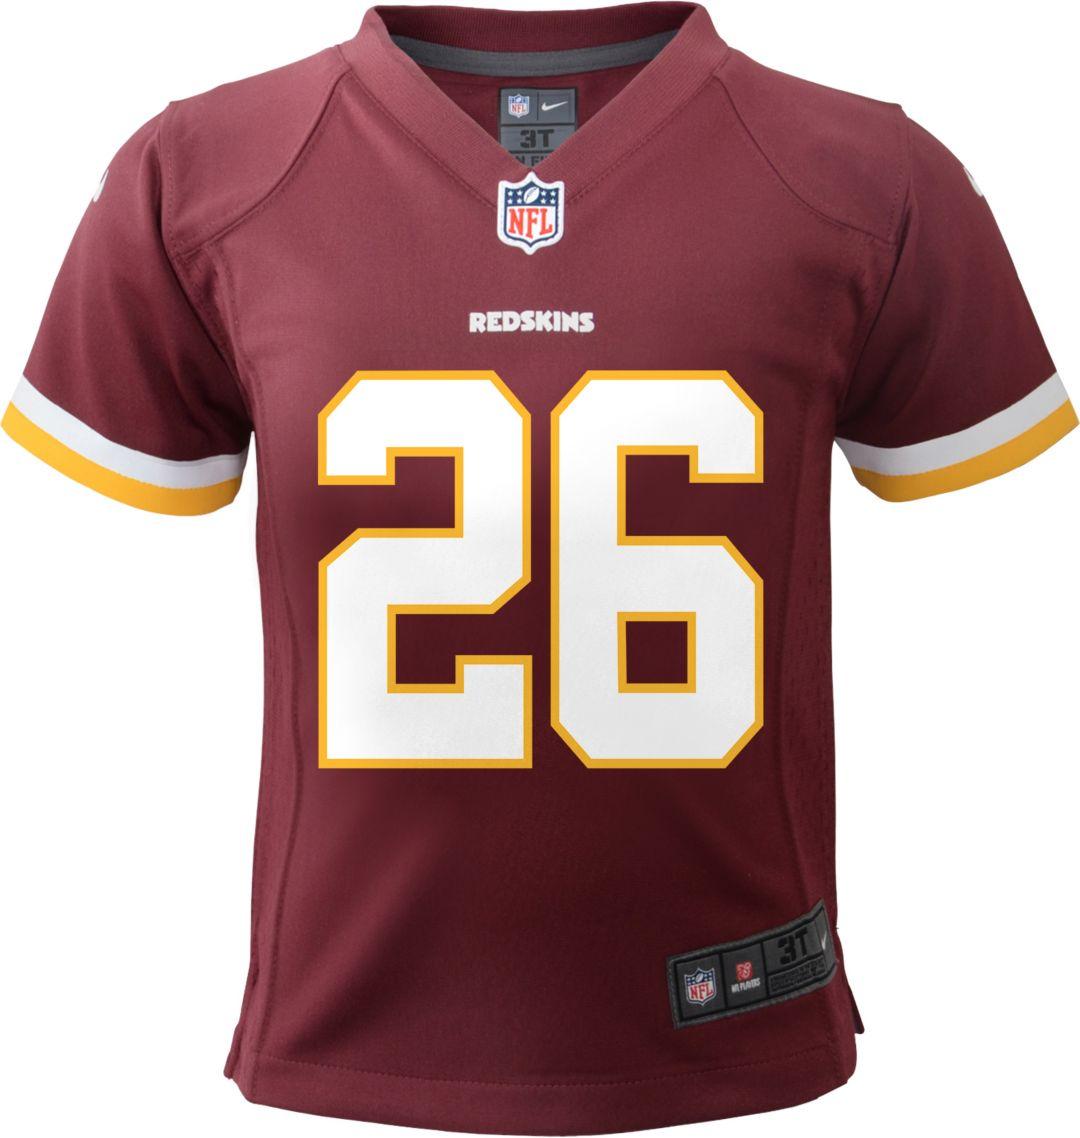 online store c2355 c8f6e Nike Boys' Home Game Jersey Washington Redskins Adrian Peterson #29